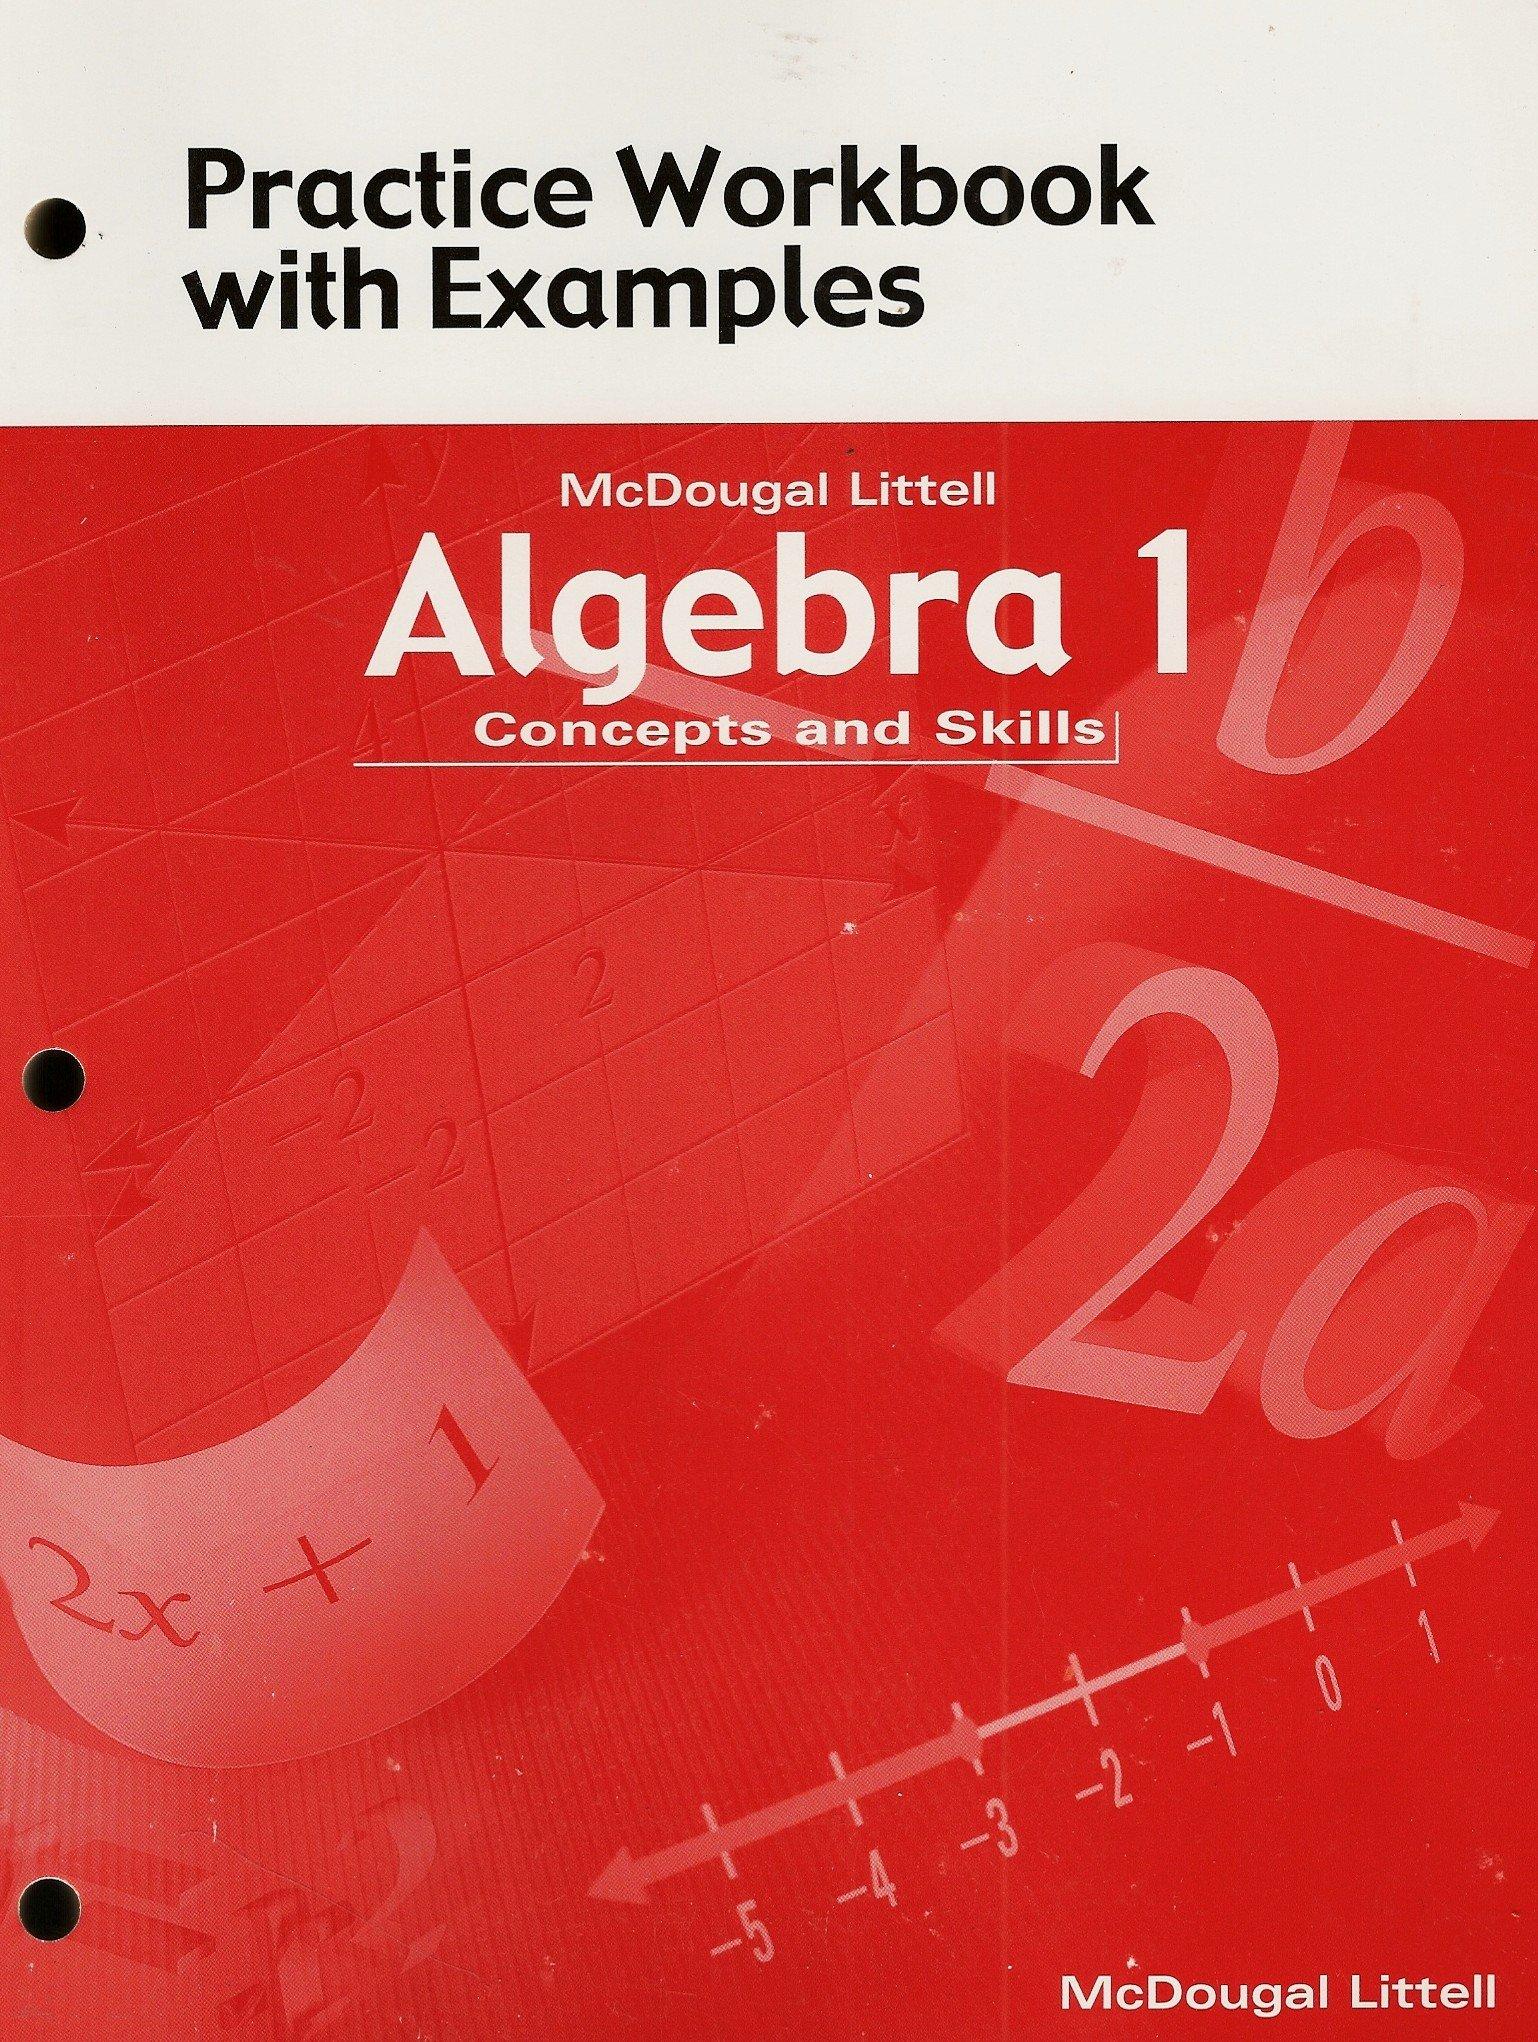 Algebra 1 concepts and skills answer key | A Plus Algebra